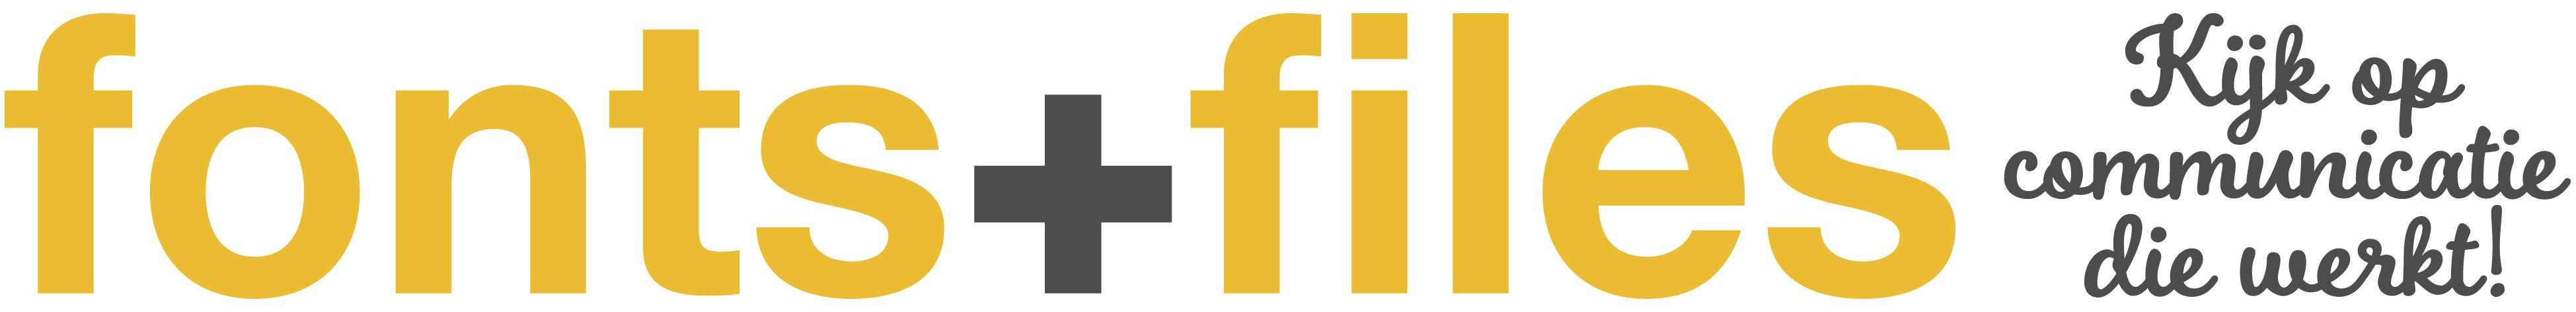 Fonts + Files